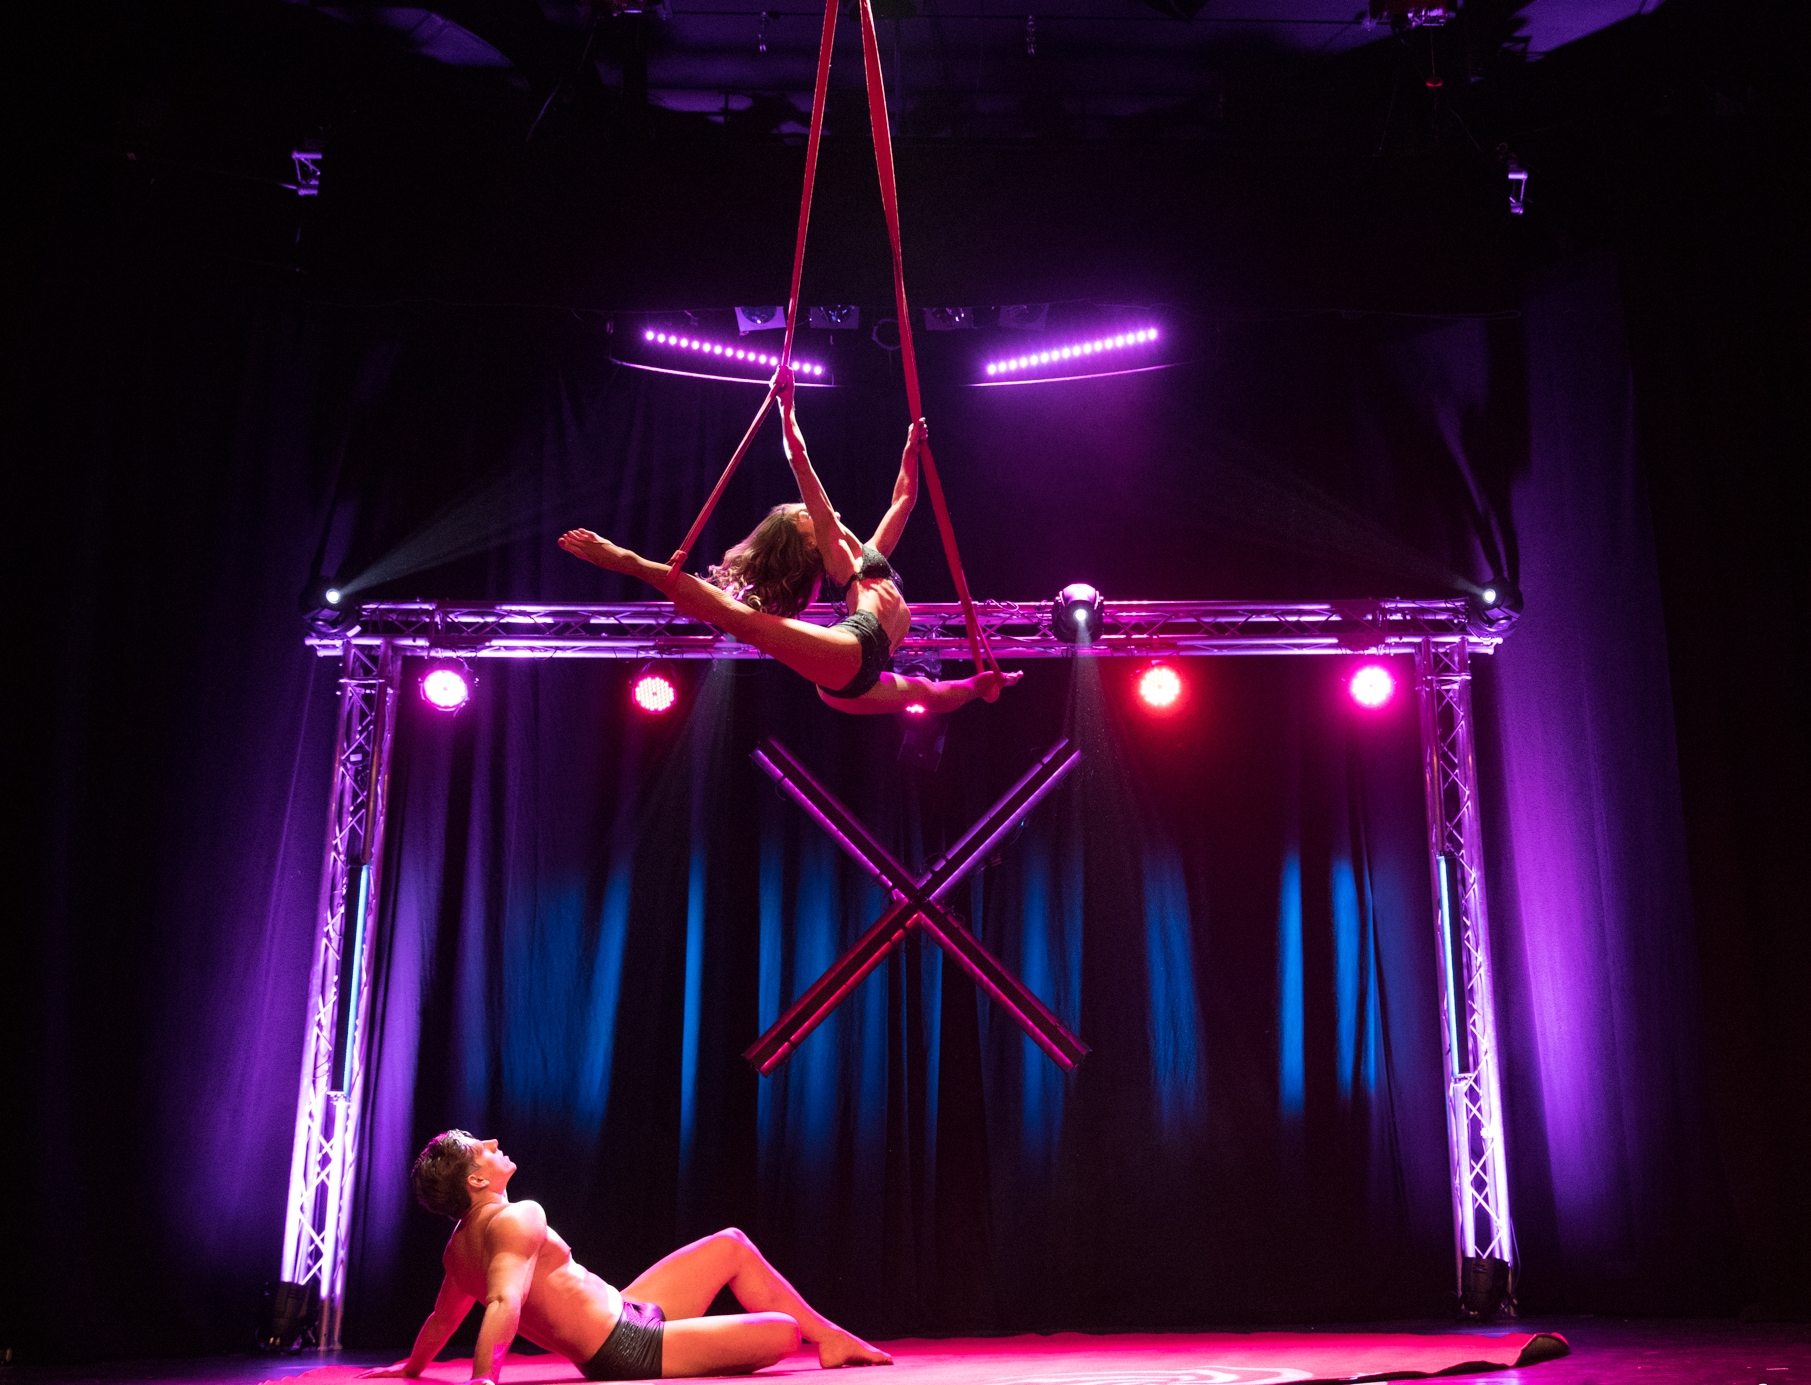 duo straps, strapaten, aerialstraps, akrobatik für events